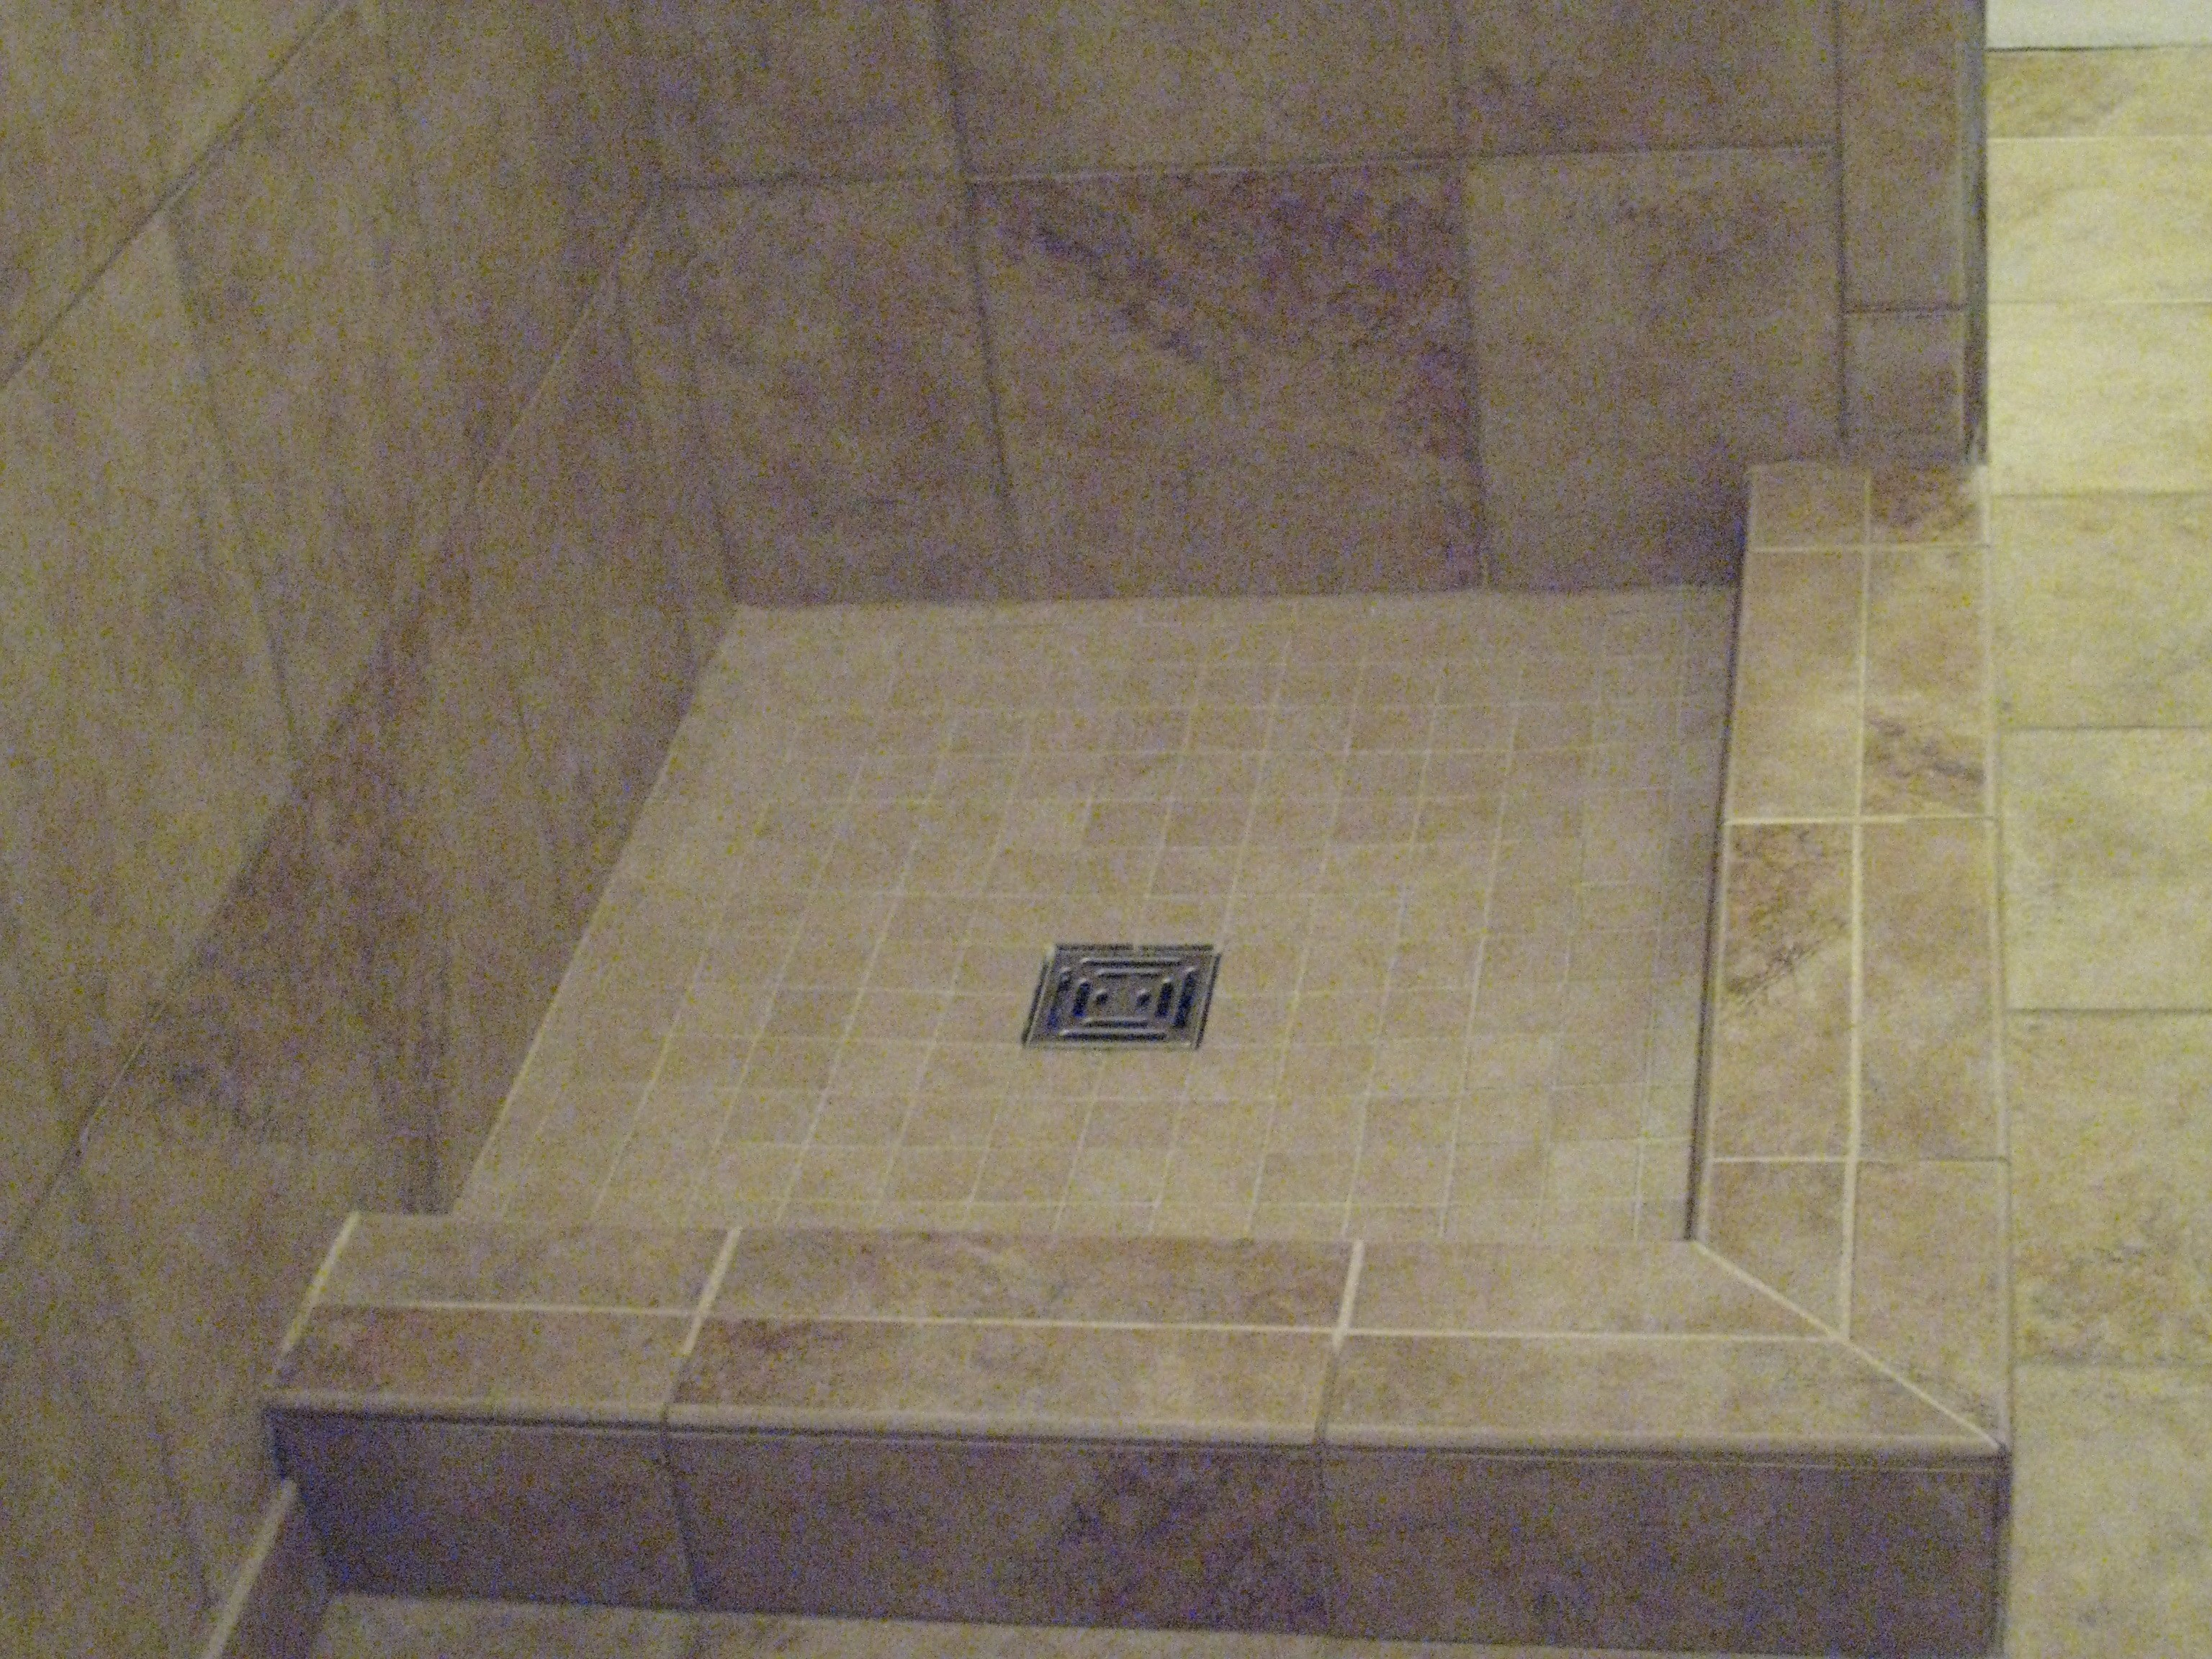 Dmj tile services renton wa 98057 angie 39 s list for Bathroom design 3x3